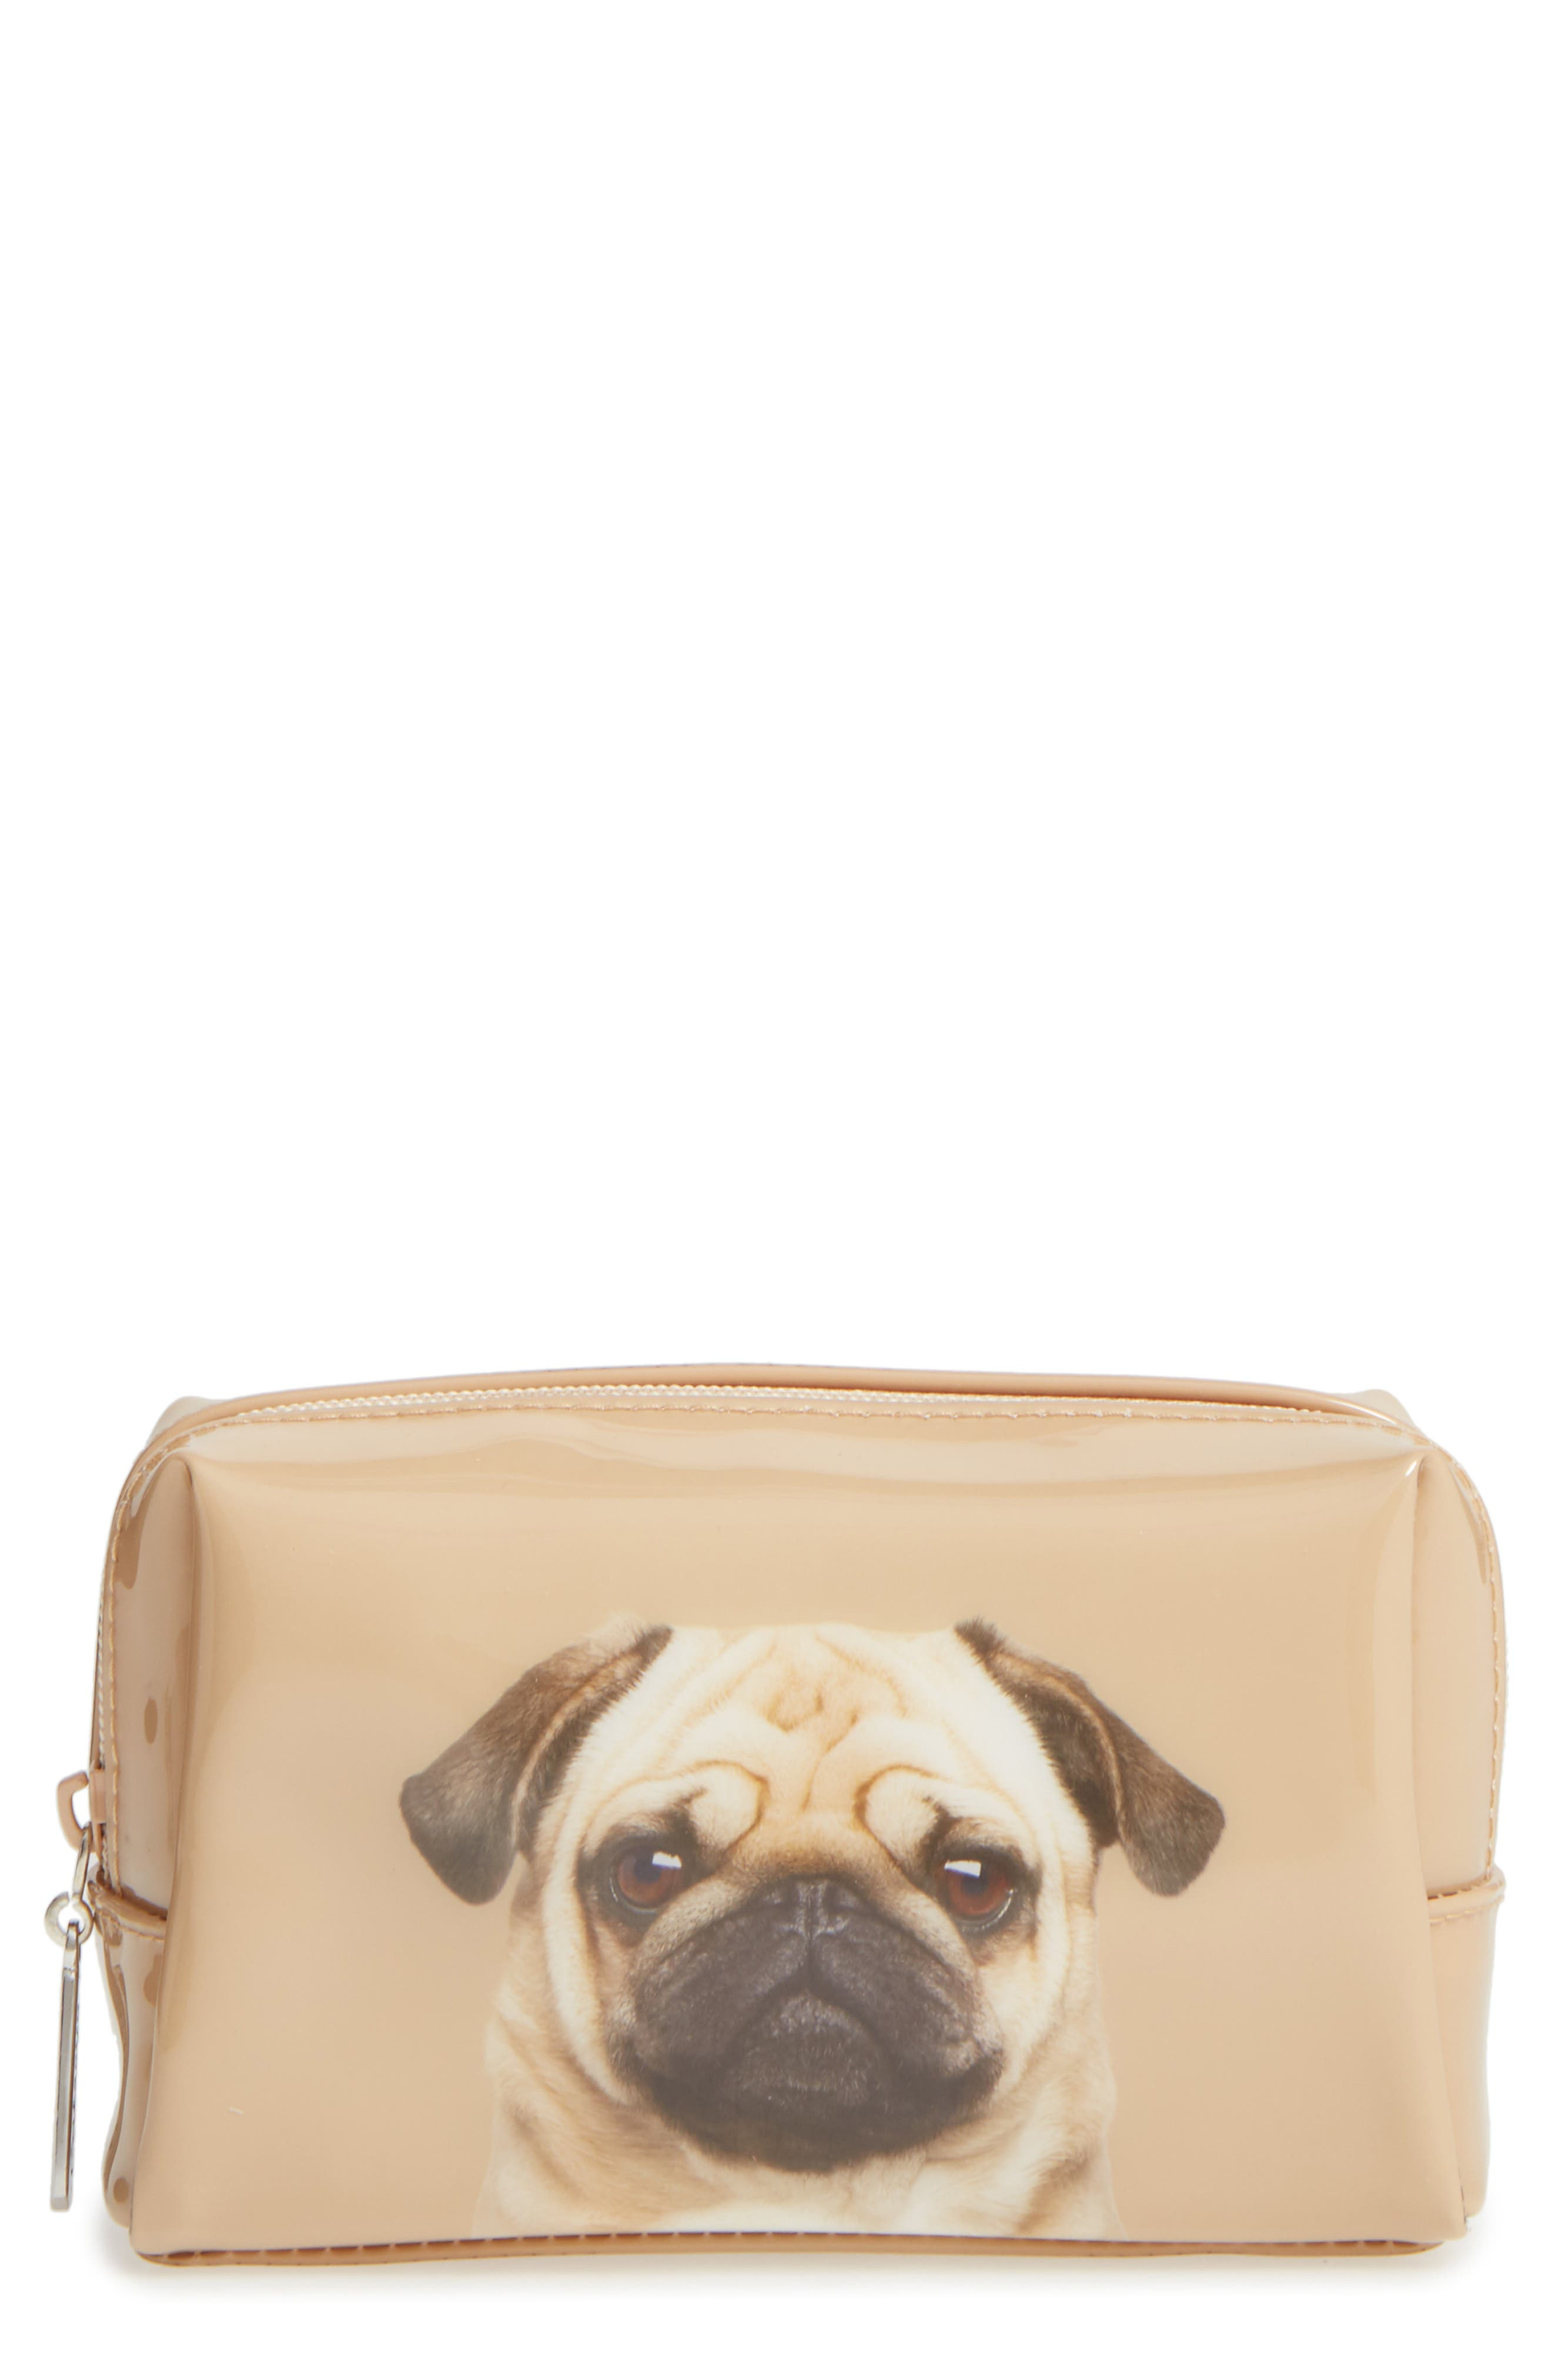 Caramel Pug Cosmetics Case,                             Main thumbnail 1, color,                             250